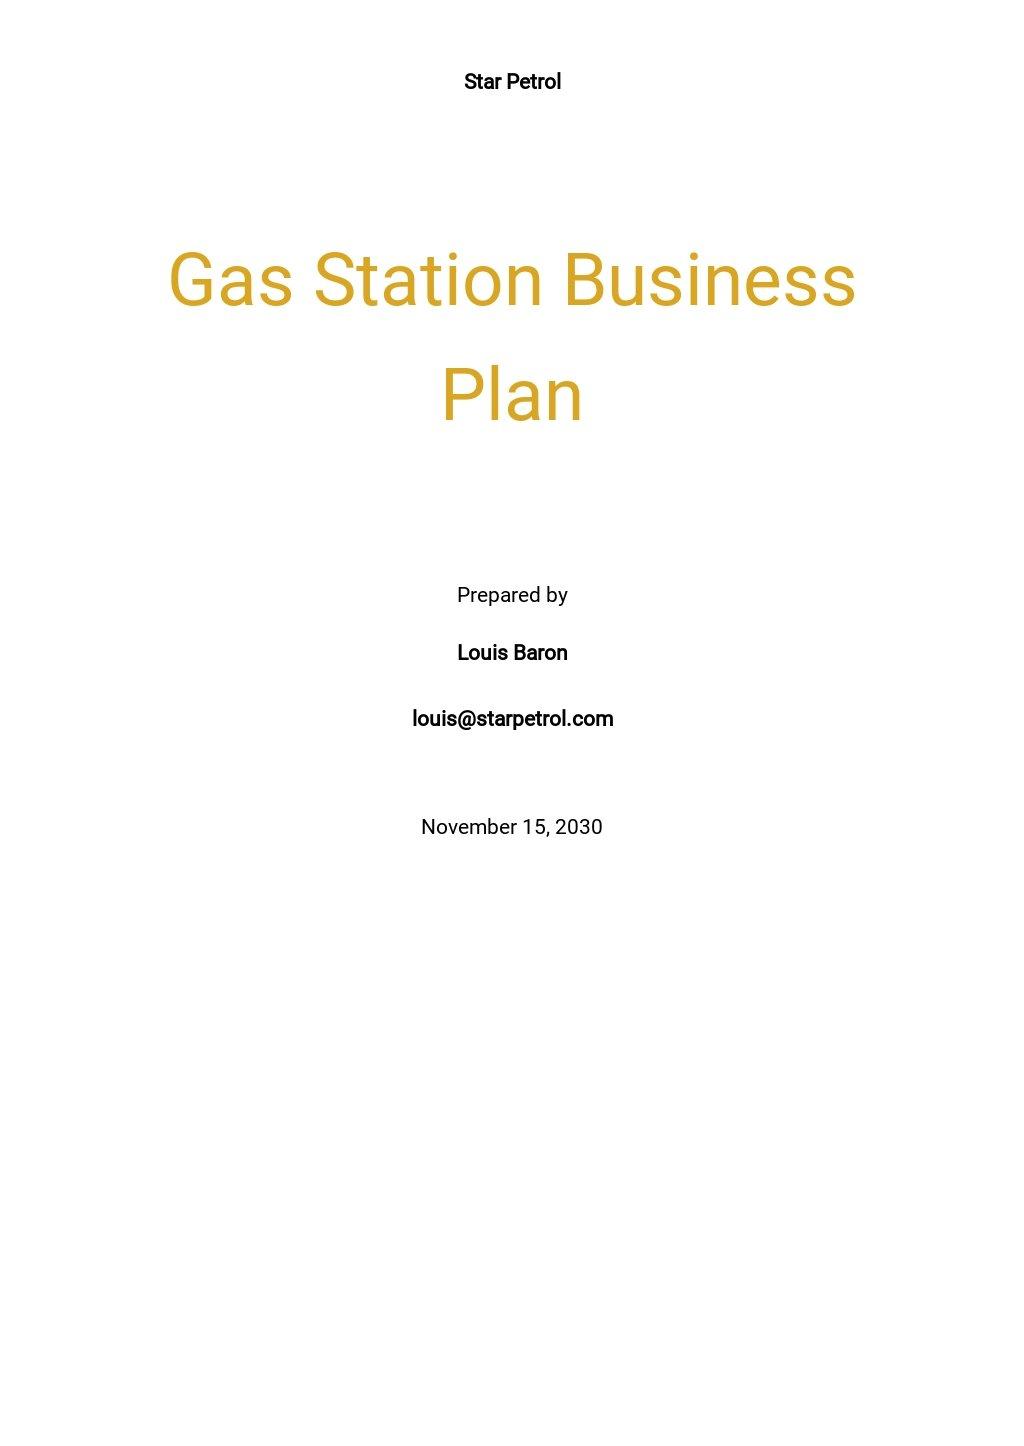 Gas Station Business Plan Template.jpe